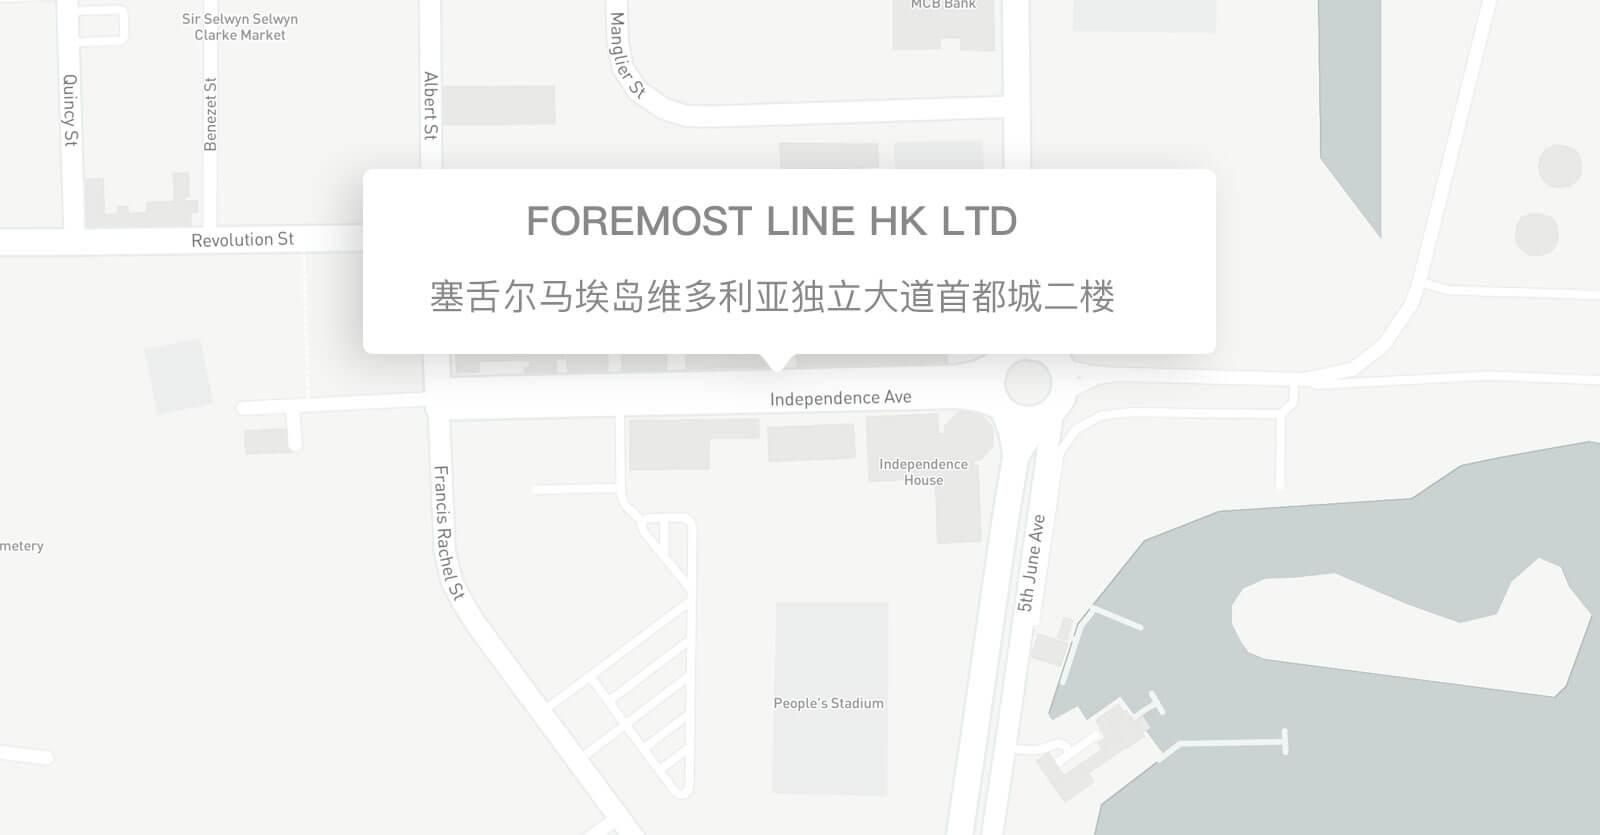 postion-map-cn